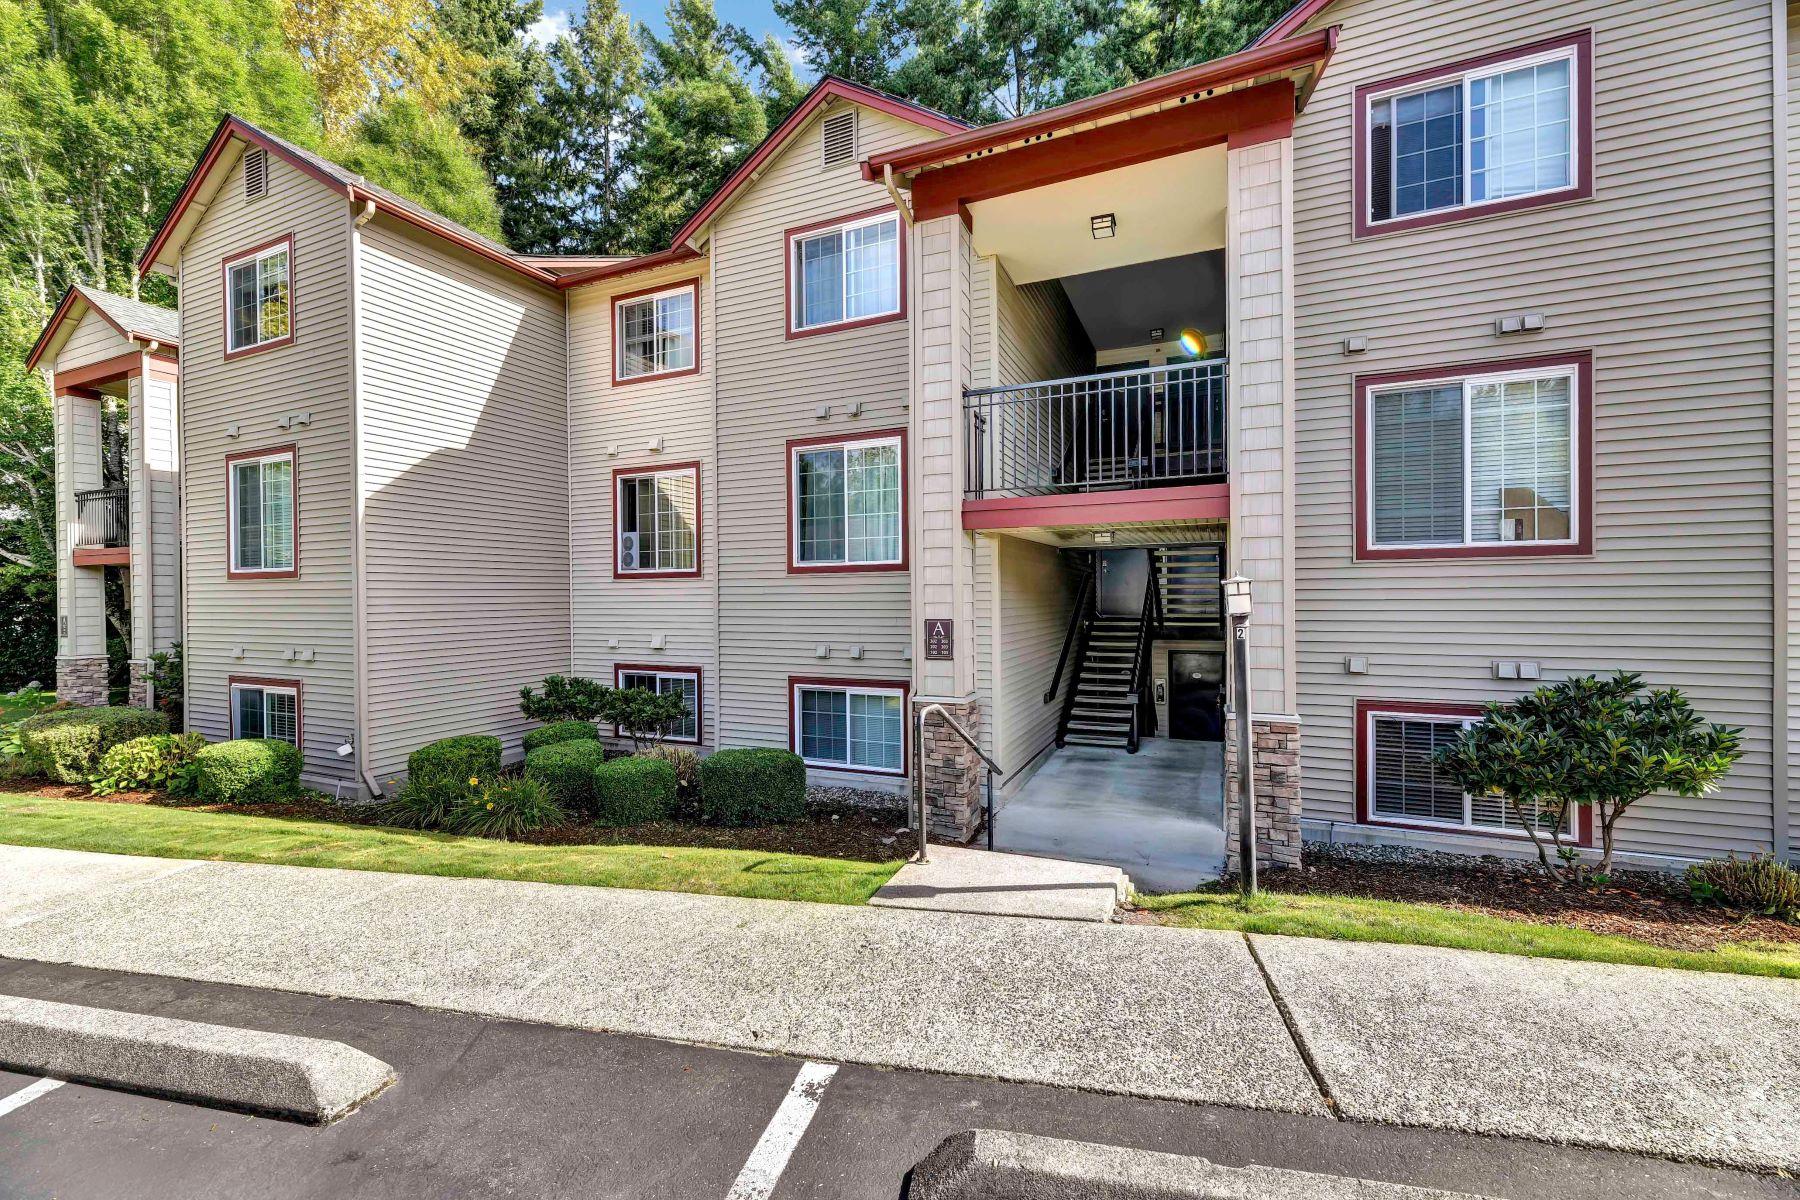 Condominiums for Sale at 25025 SE Klahanie Blvd Unit #A103, Issaquah, WA 98029 25025 SE Klahanie Blvd Unit #A103 Issaquah, Washington 98029 United States